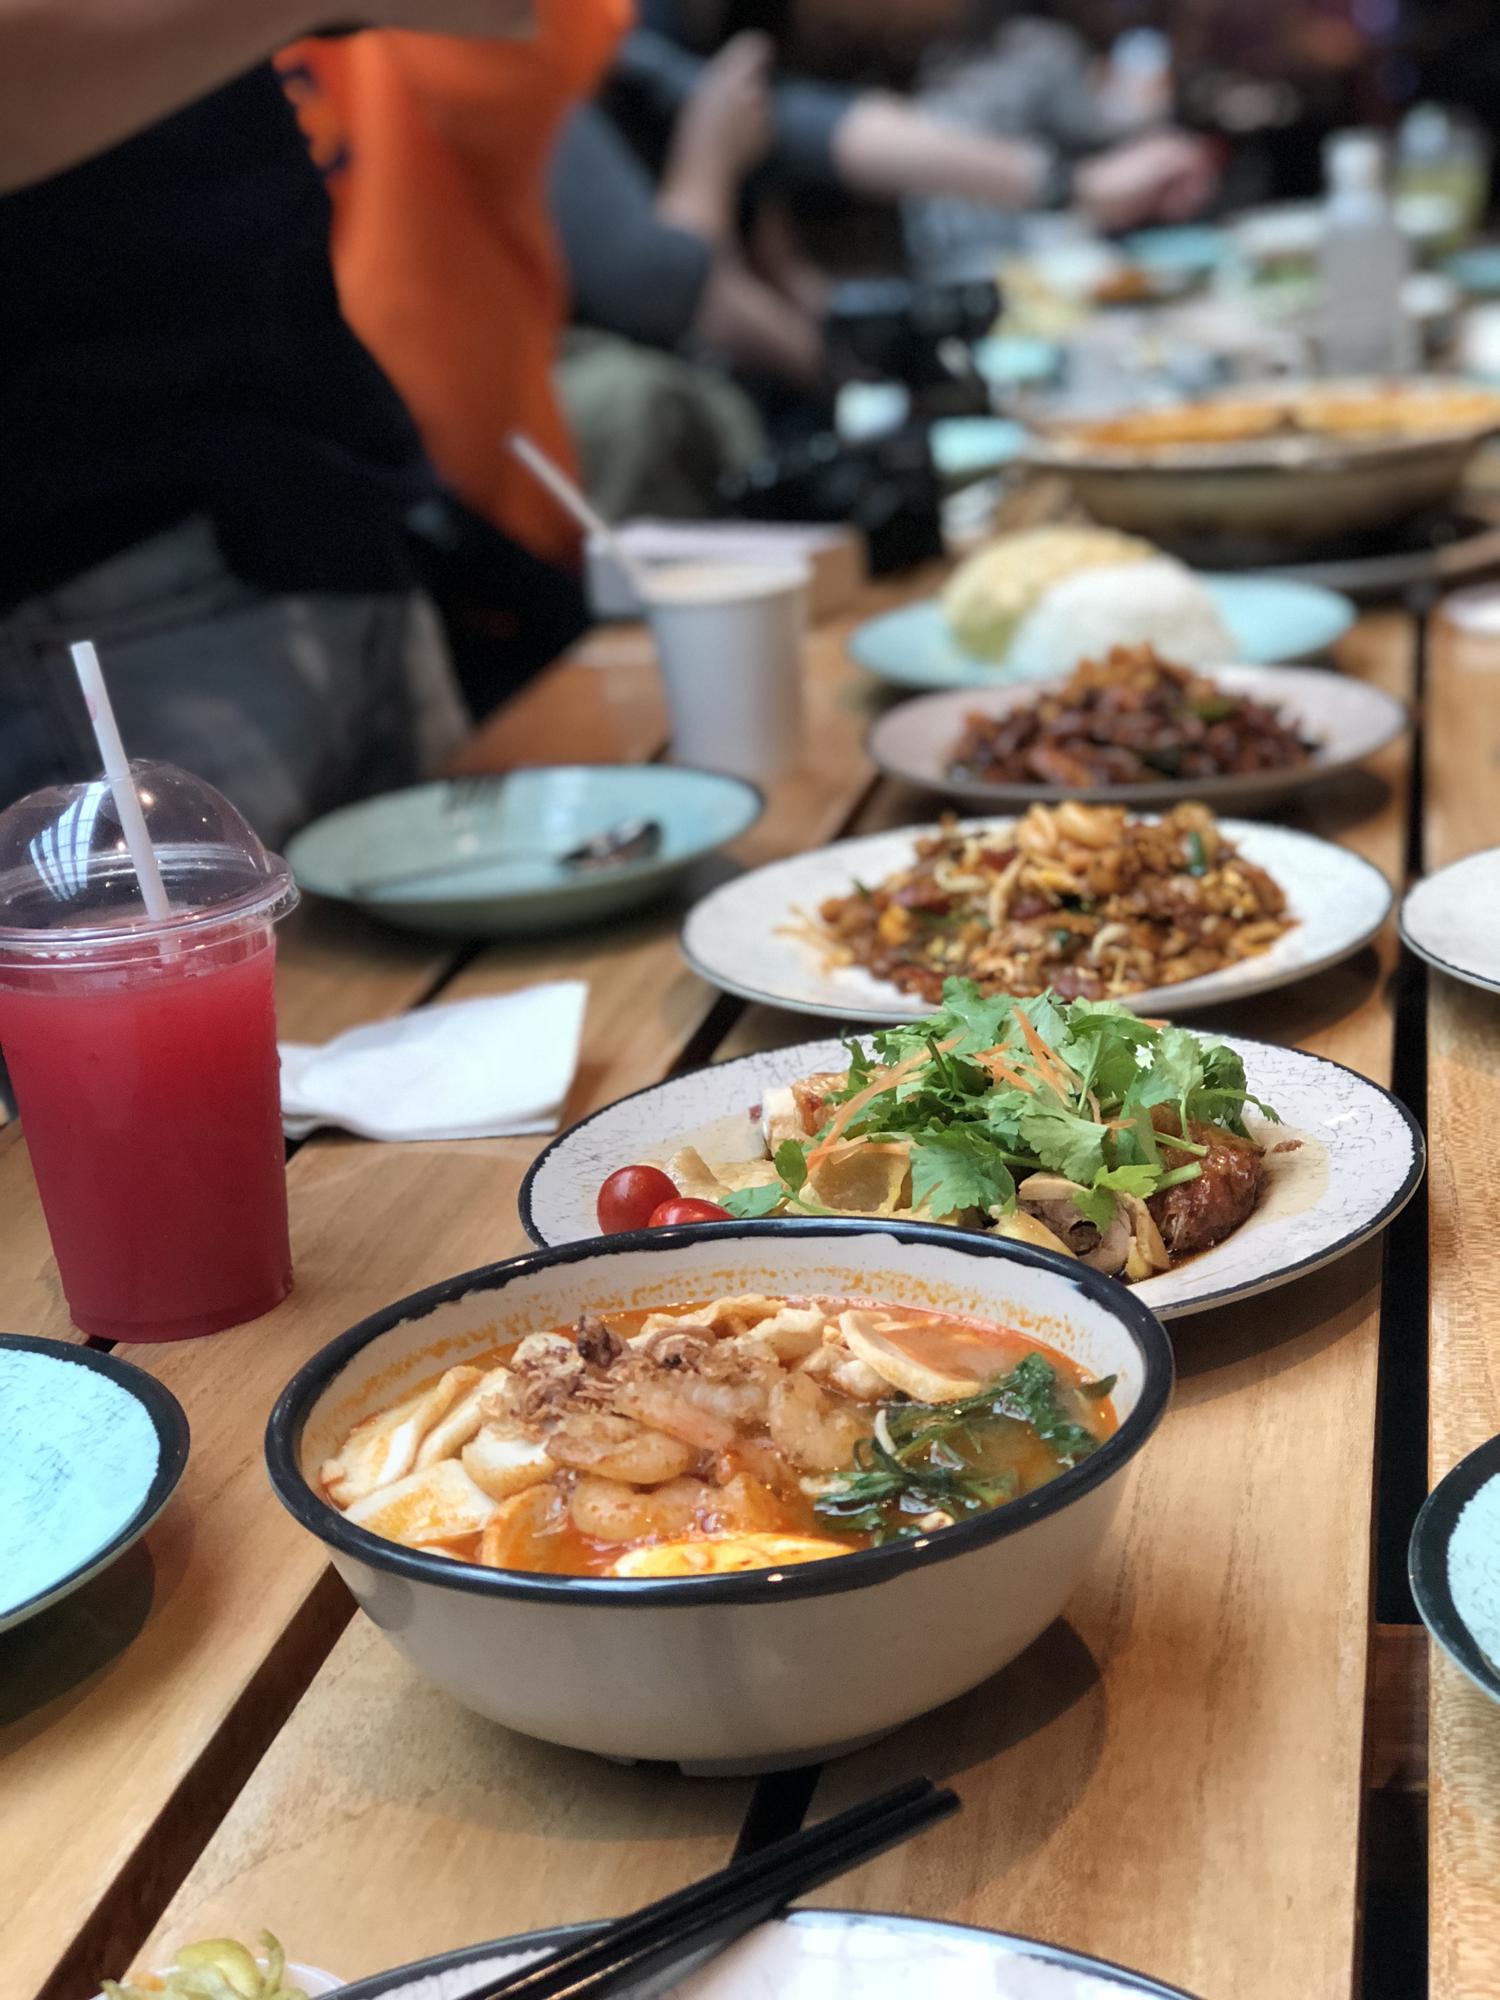 Genting_Highlands_Good_Food_Malaysian_Food_Street_1